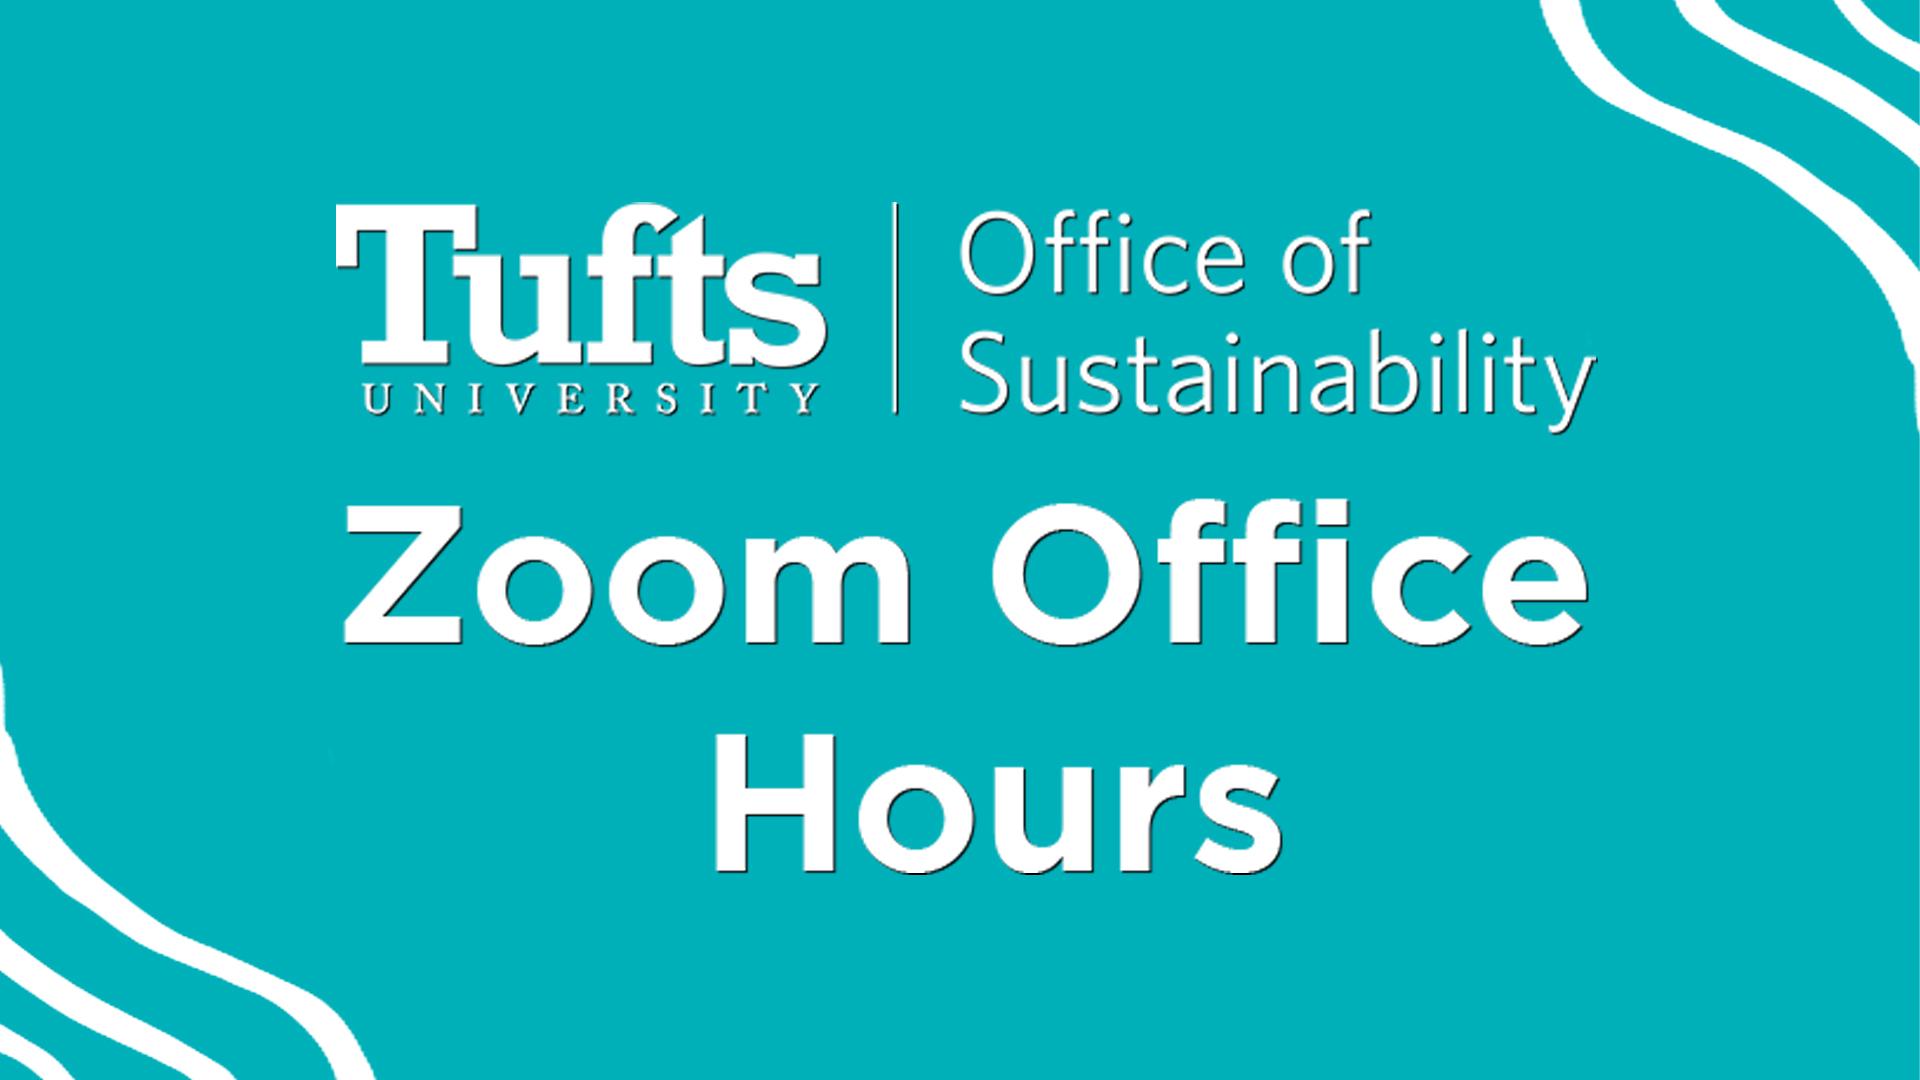 OOS Staff Weekly Office Hours